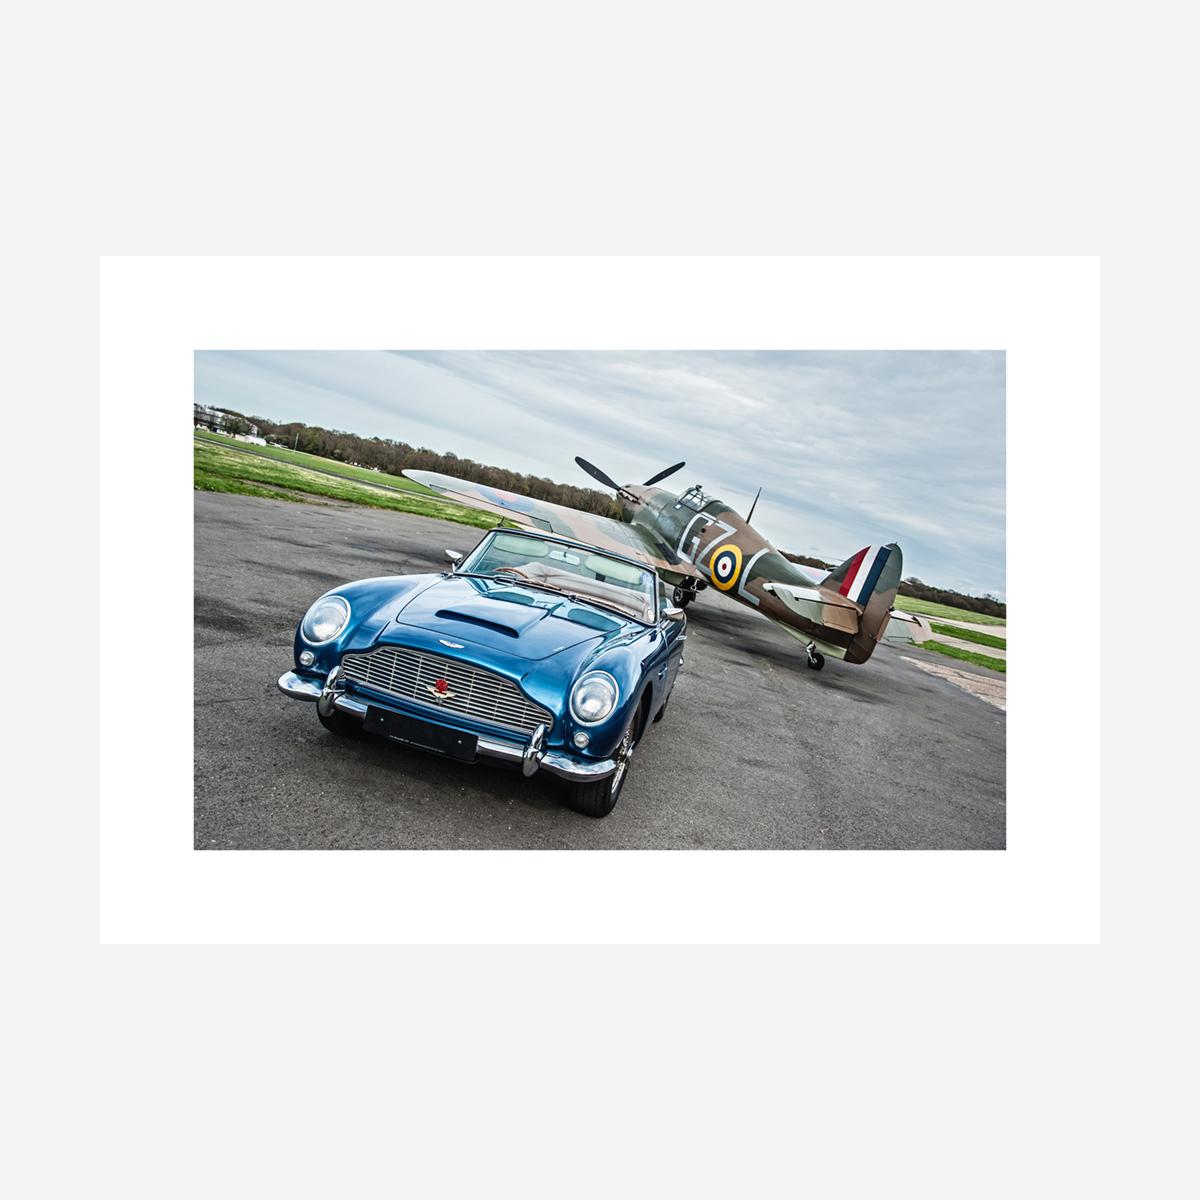 "Aston Martin DB5 & Hawker Hurricane 32"" x 22"""